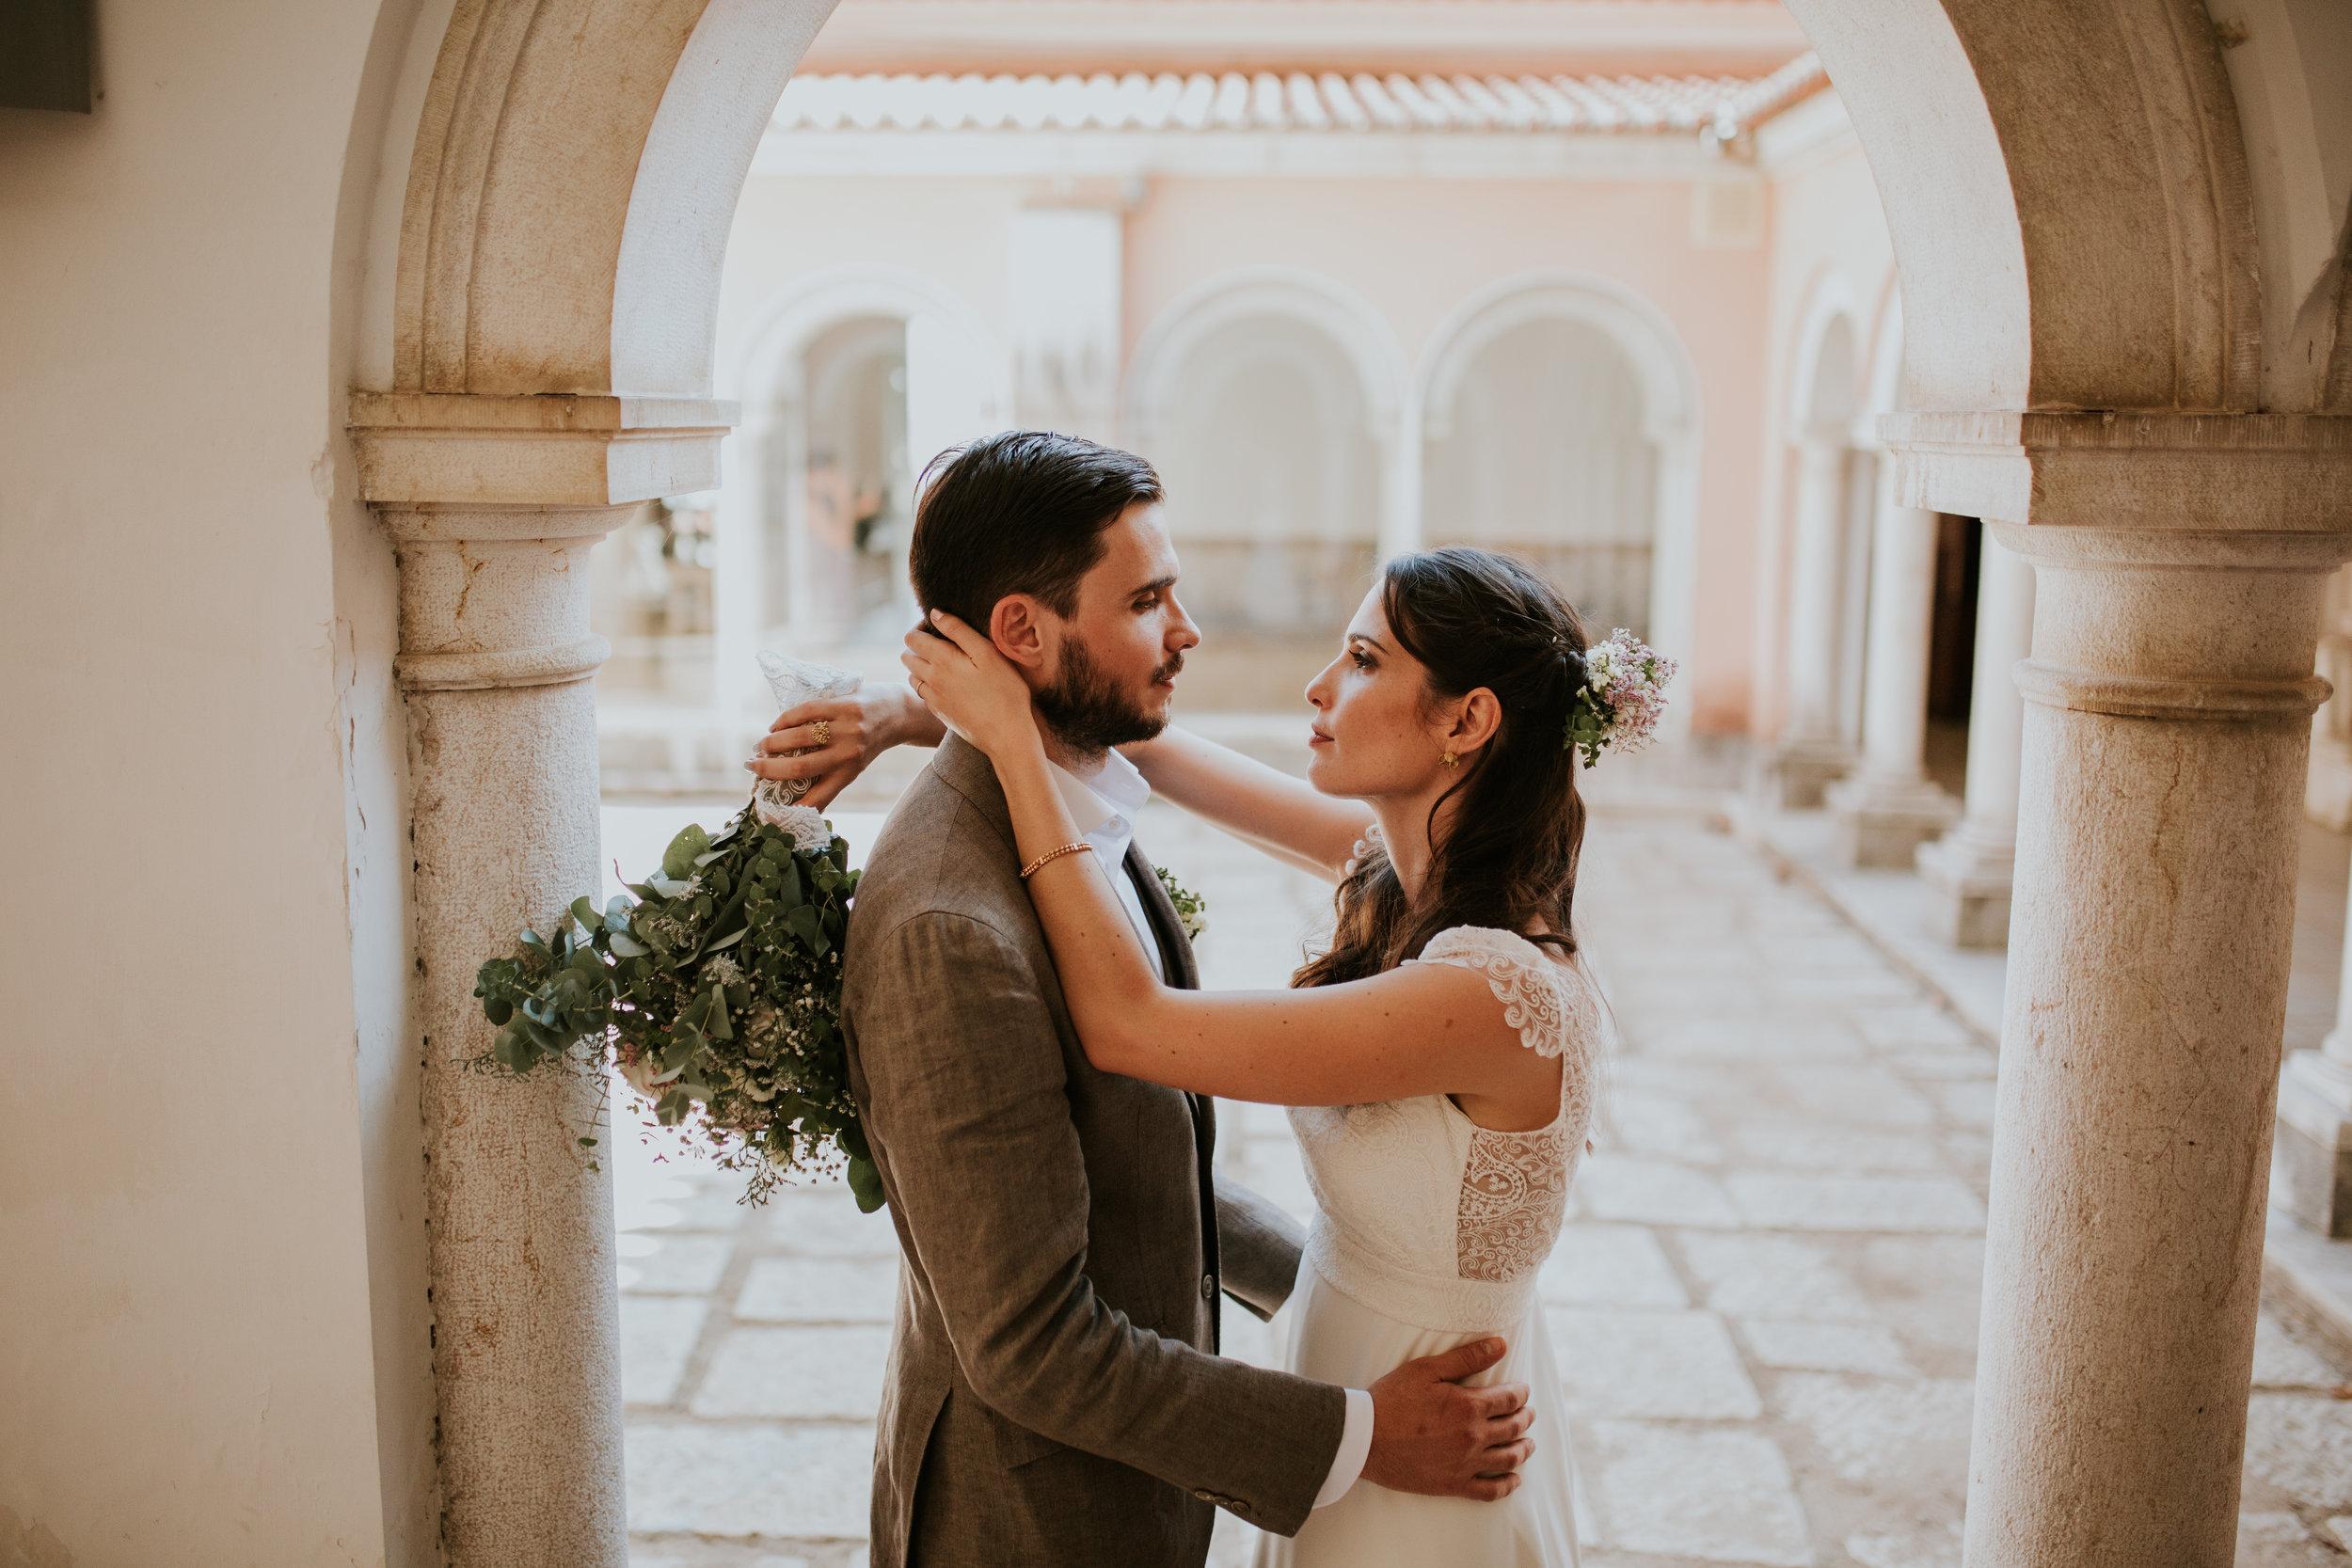 J&P 468_ 02 setembro 2017 Wedding day_.jpg